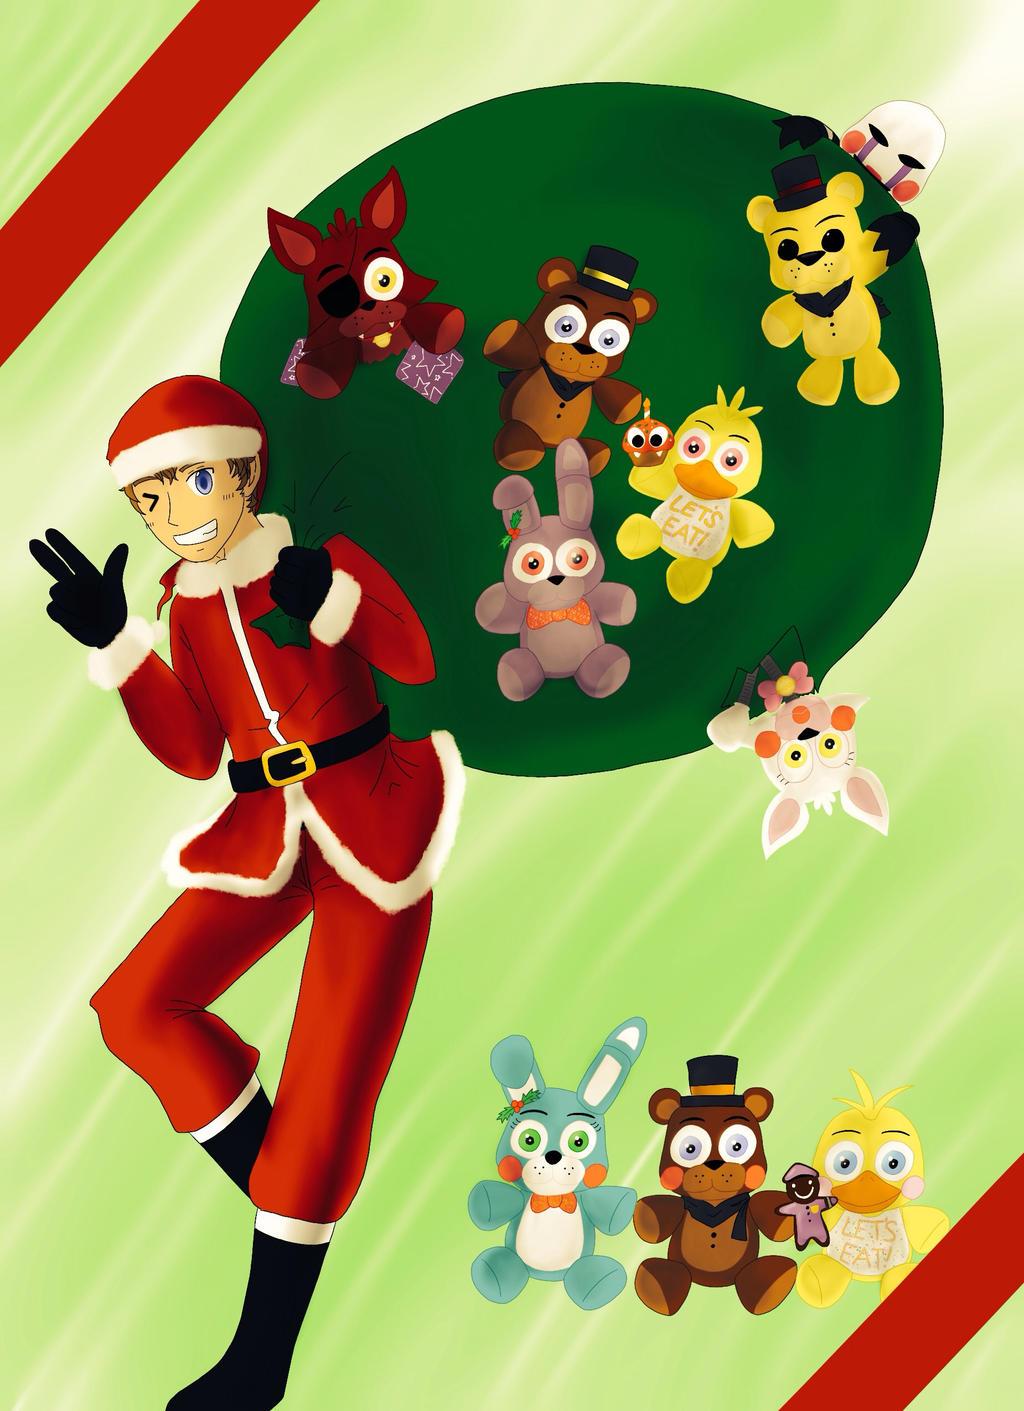 5 Nights At Freddy's 2 - Christmas by KuroOkami97 on DeviantArt